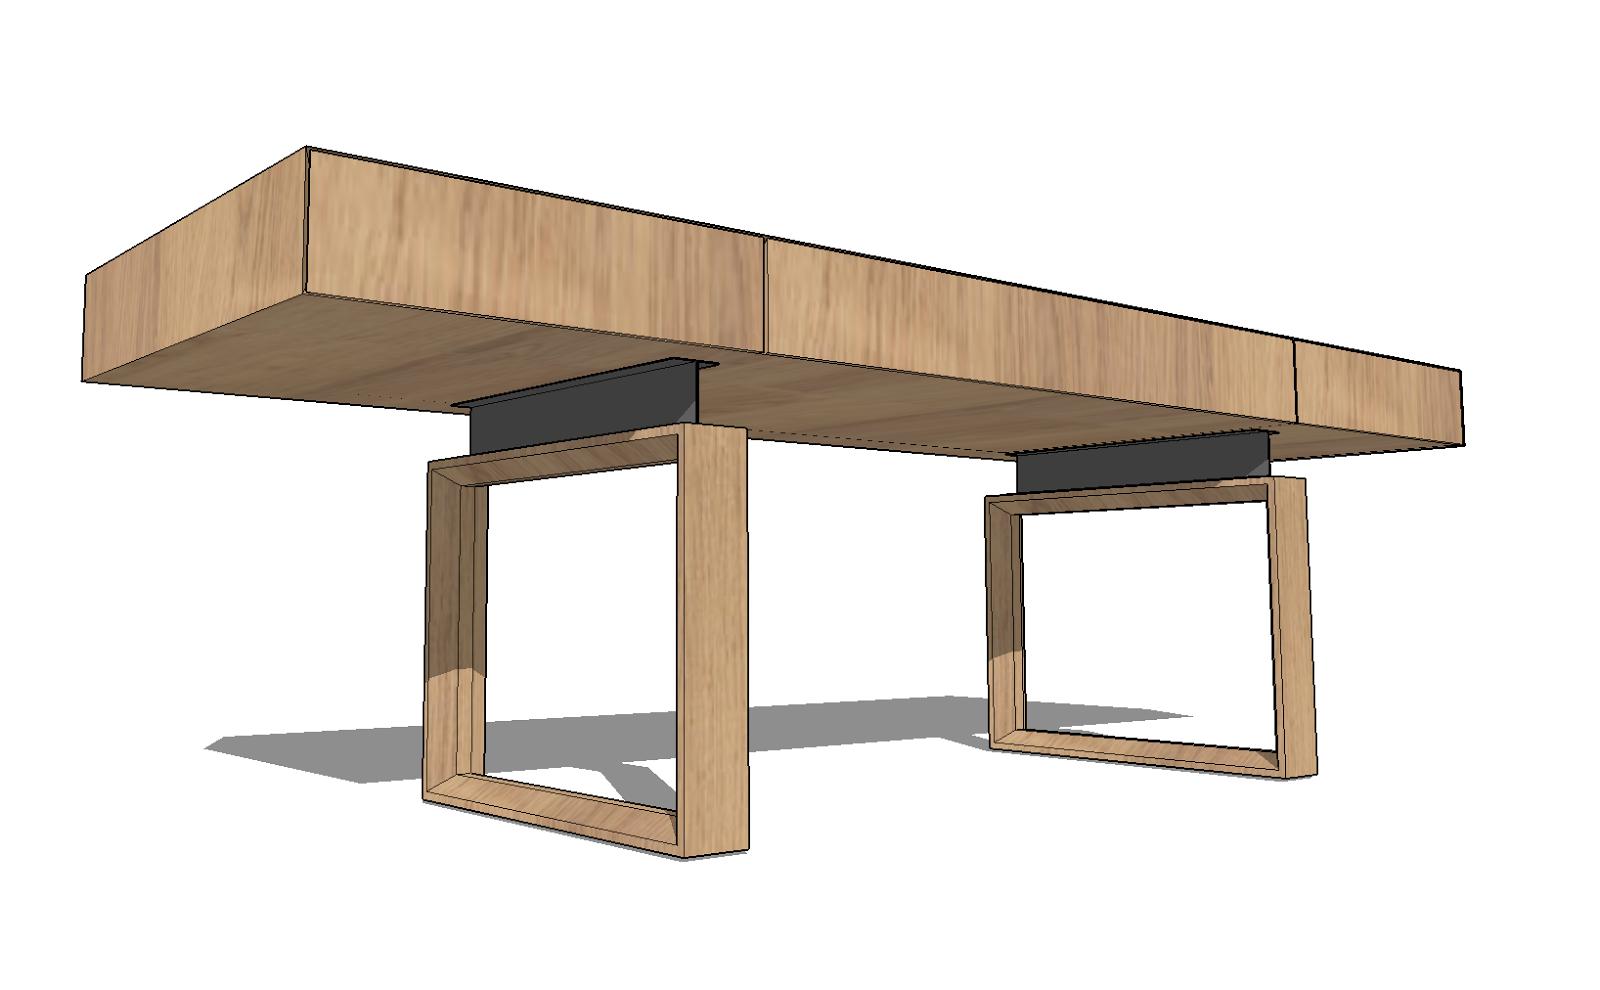 fukusu: Furniture Design - Modern Minimalist Wooden ...